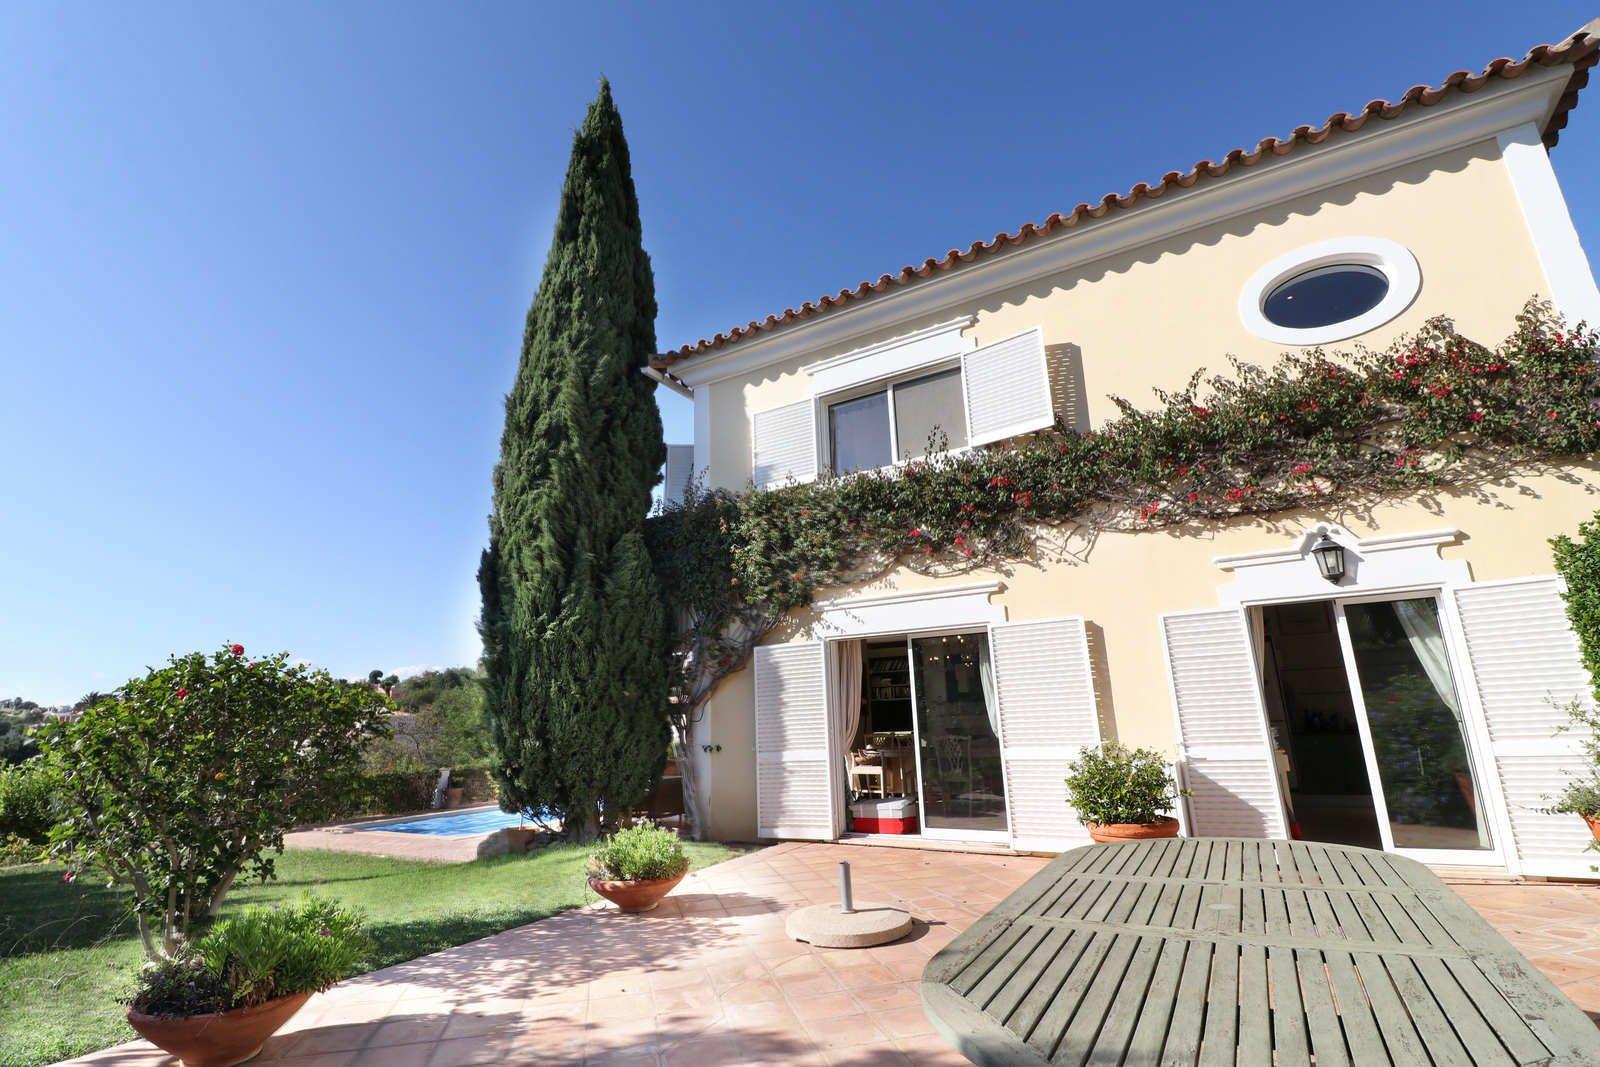 4 Bedroom Villa Almancil, Central Algarve Ref: PV3648